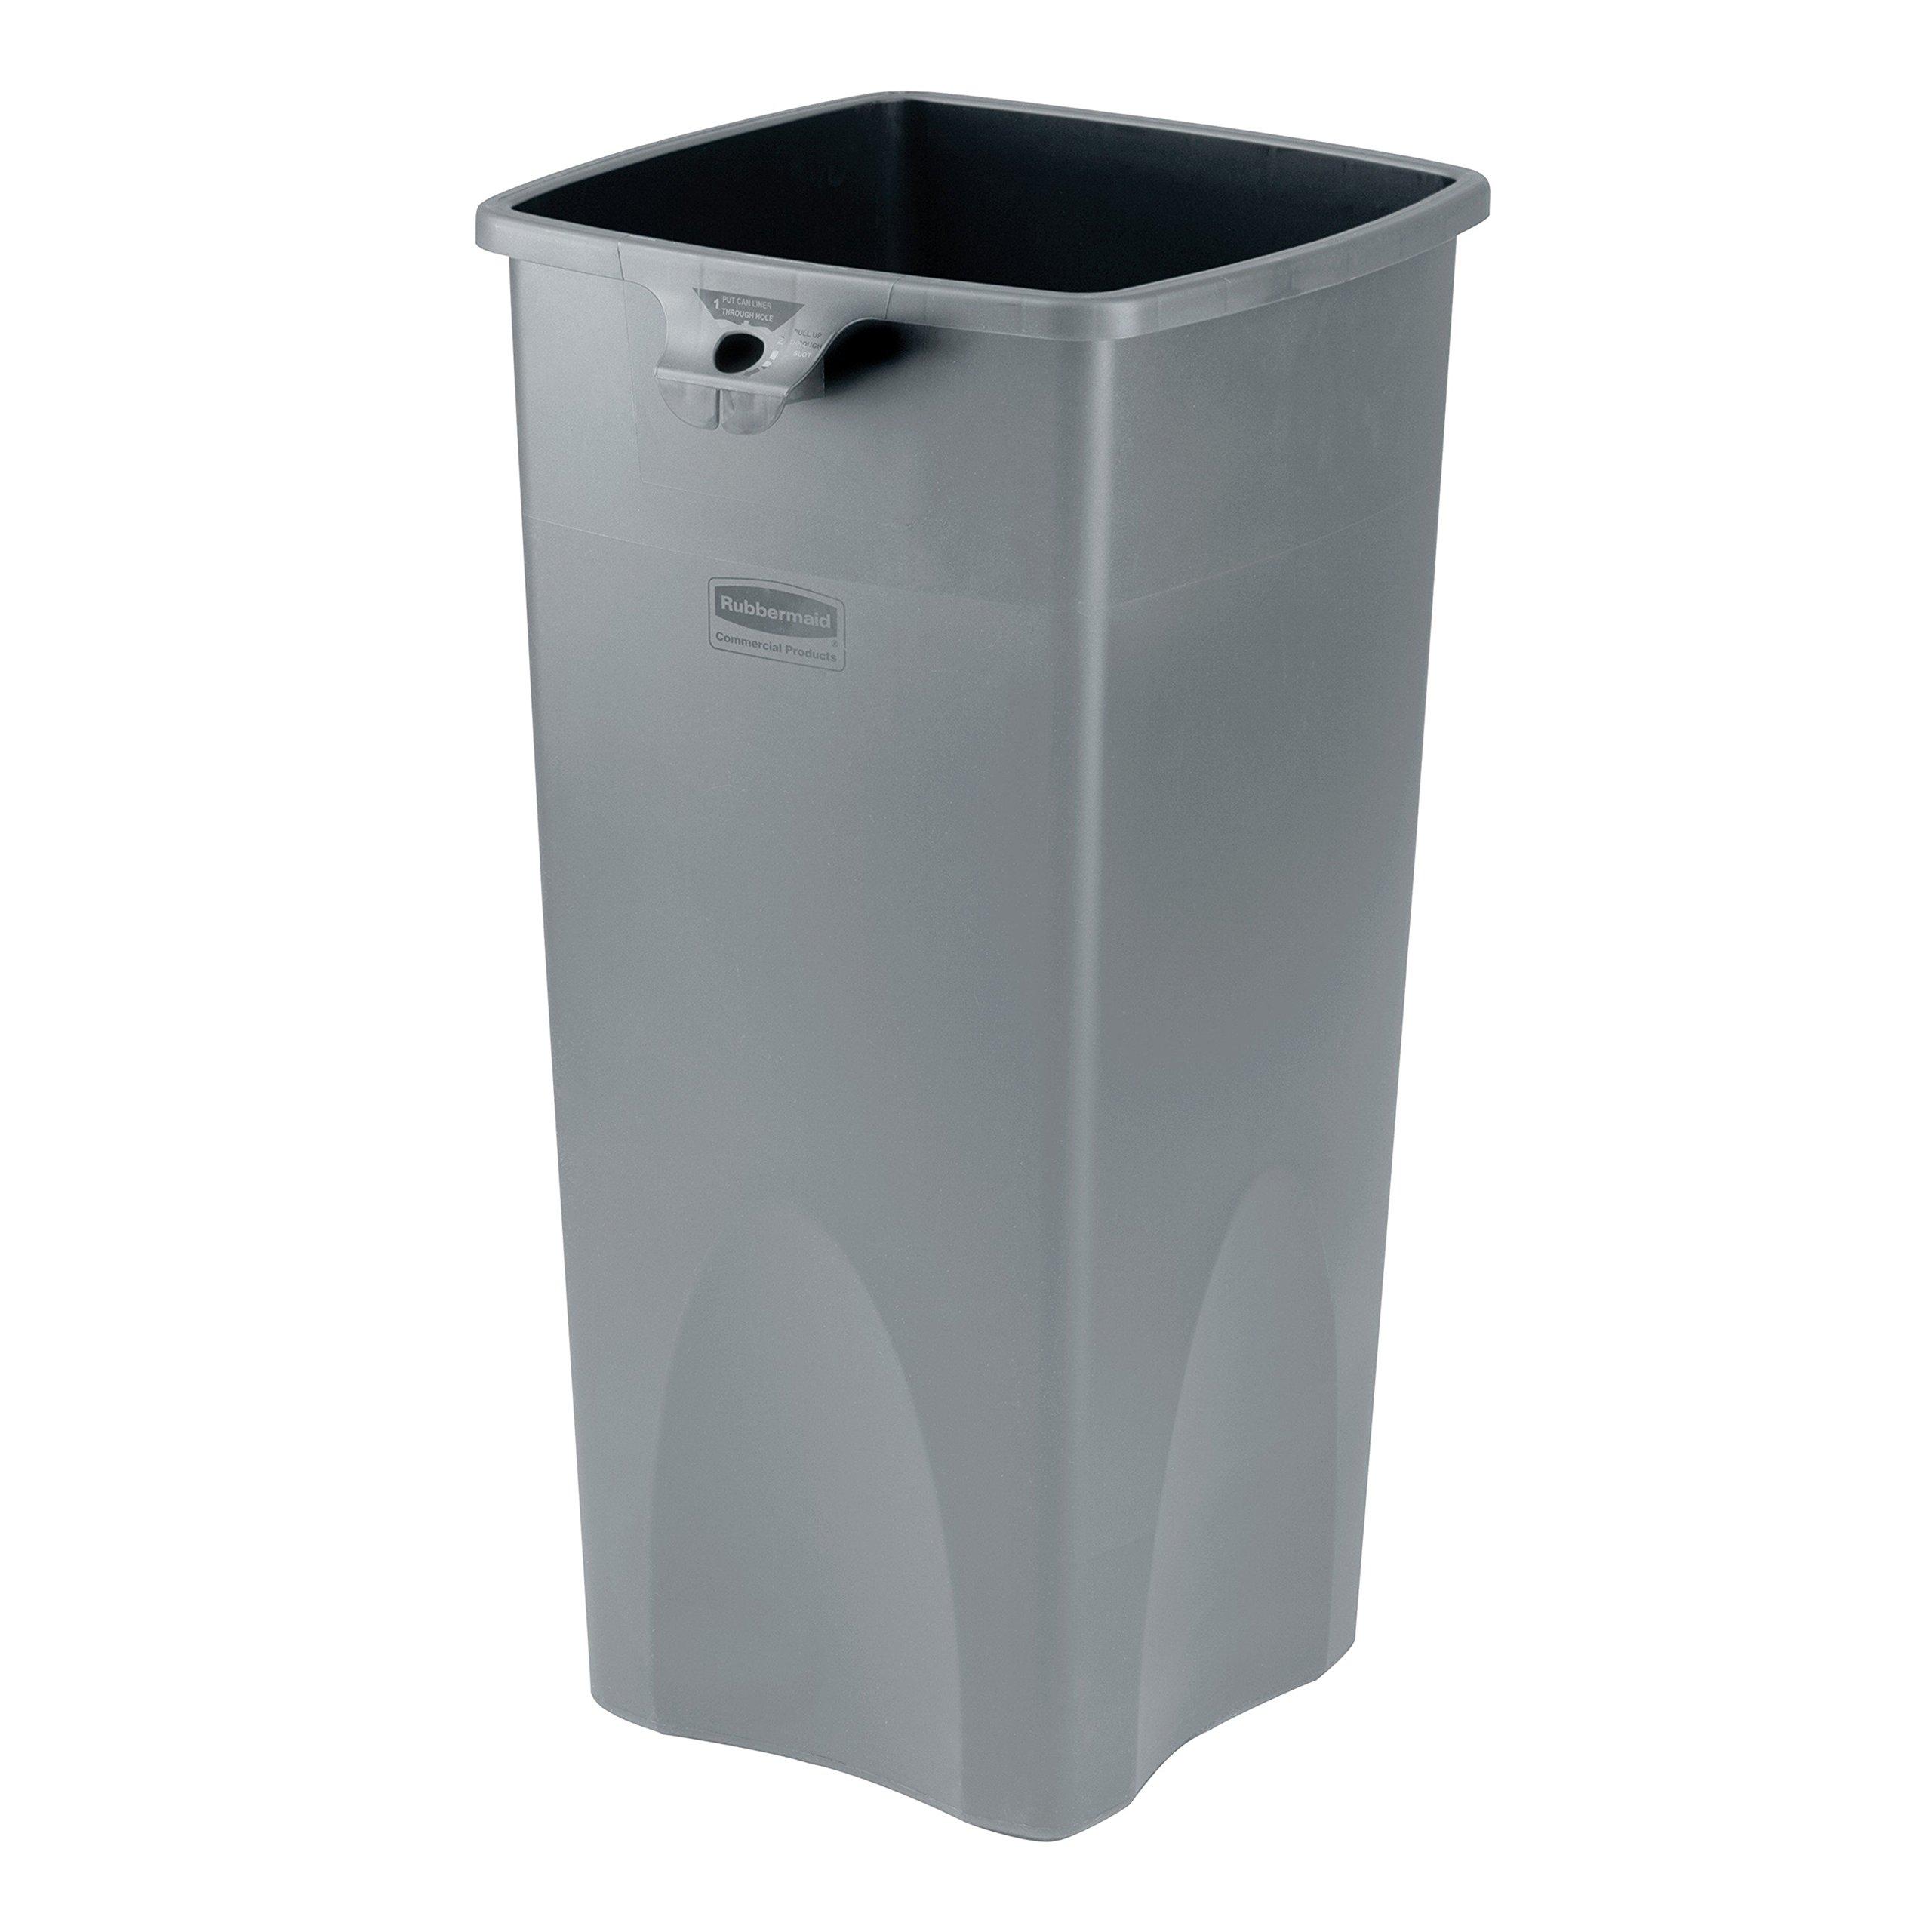 Rubbermaid Commercial FG356988GRAY Square 23-Gallon Untouchable Trash Can, Gray